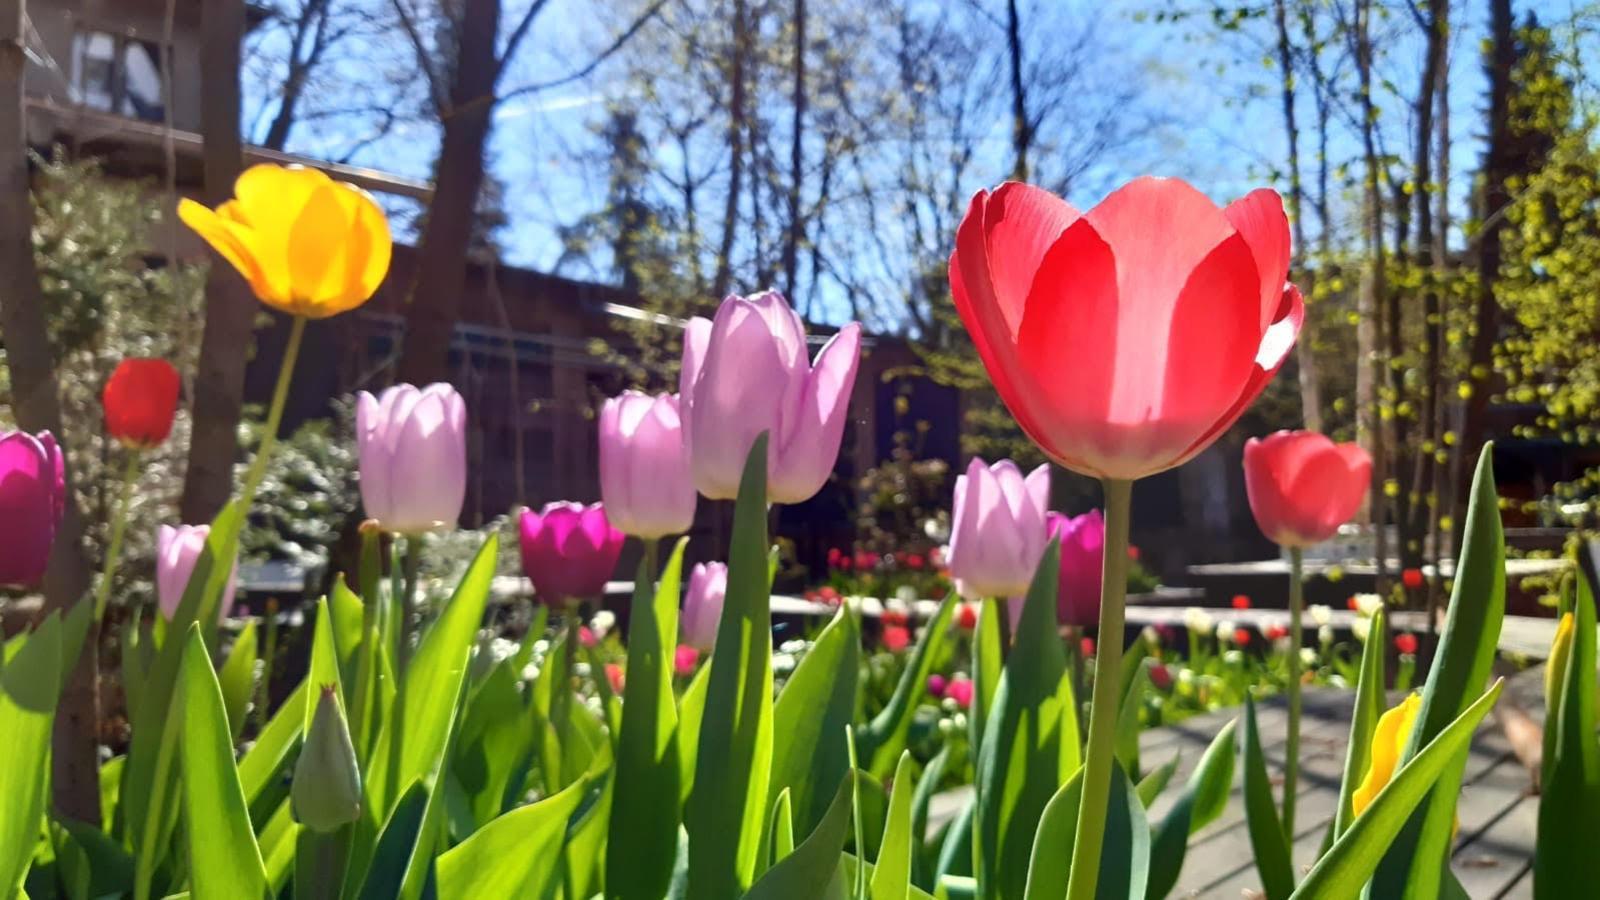 About Blank Garten